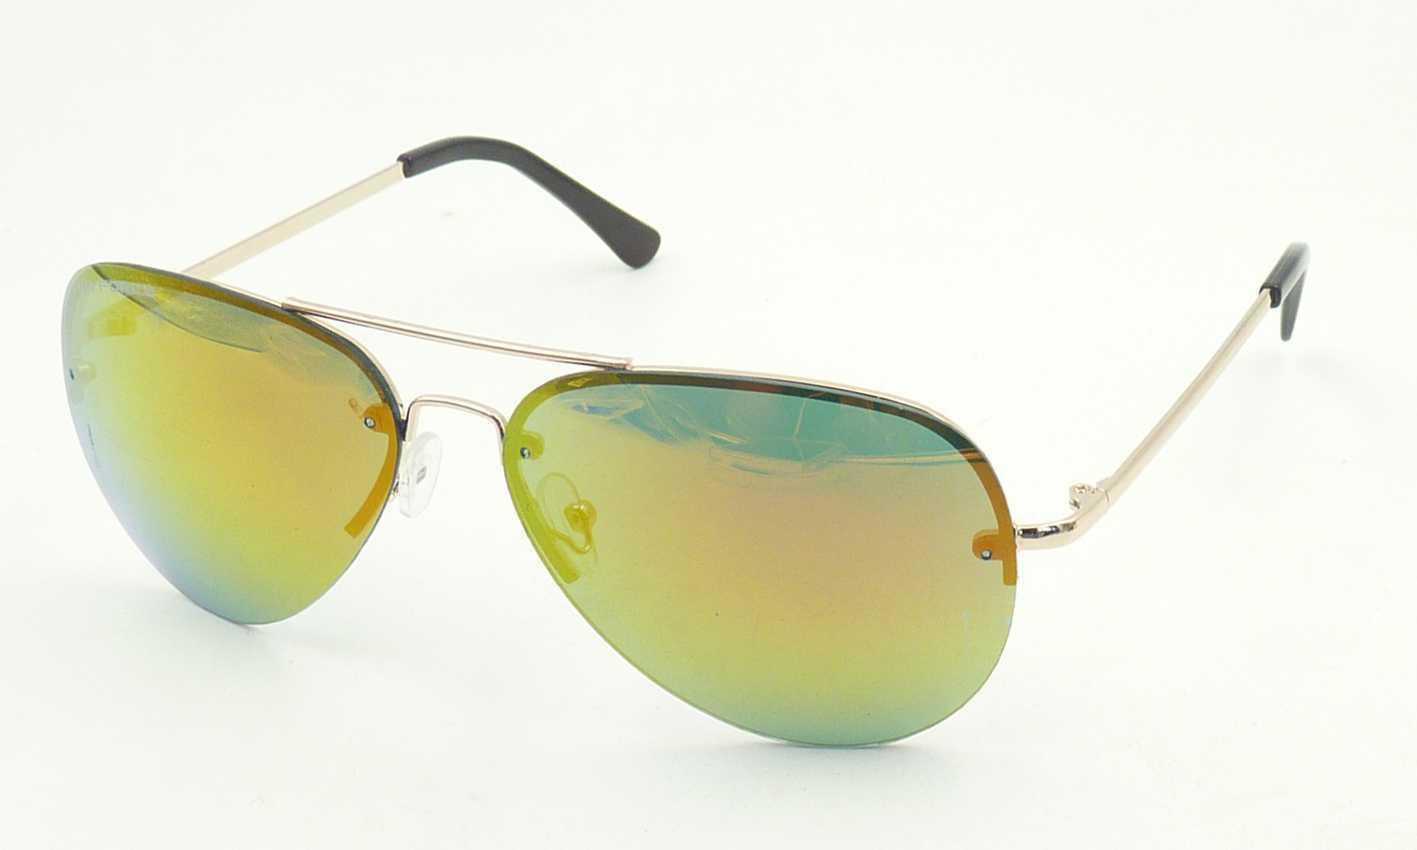 Fqm161126 New Design Good Quality Hotsale Unisex Metal Sunglasses